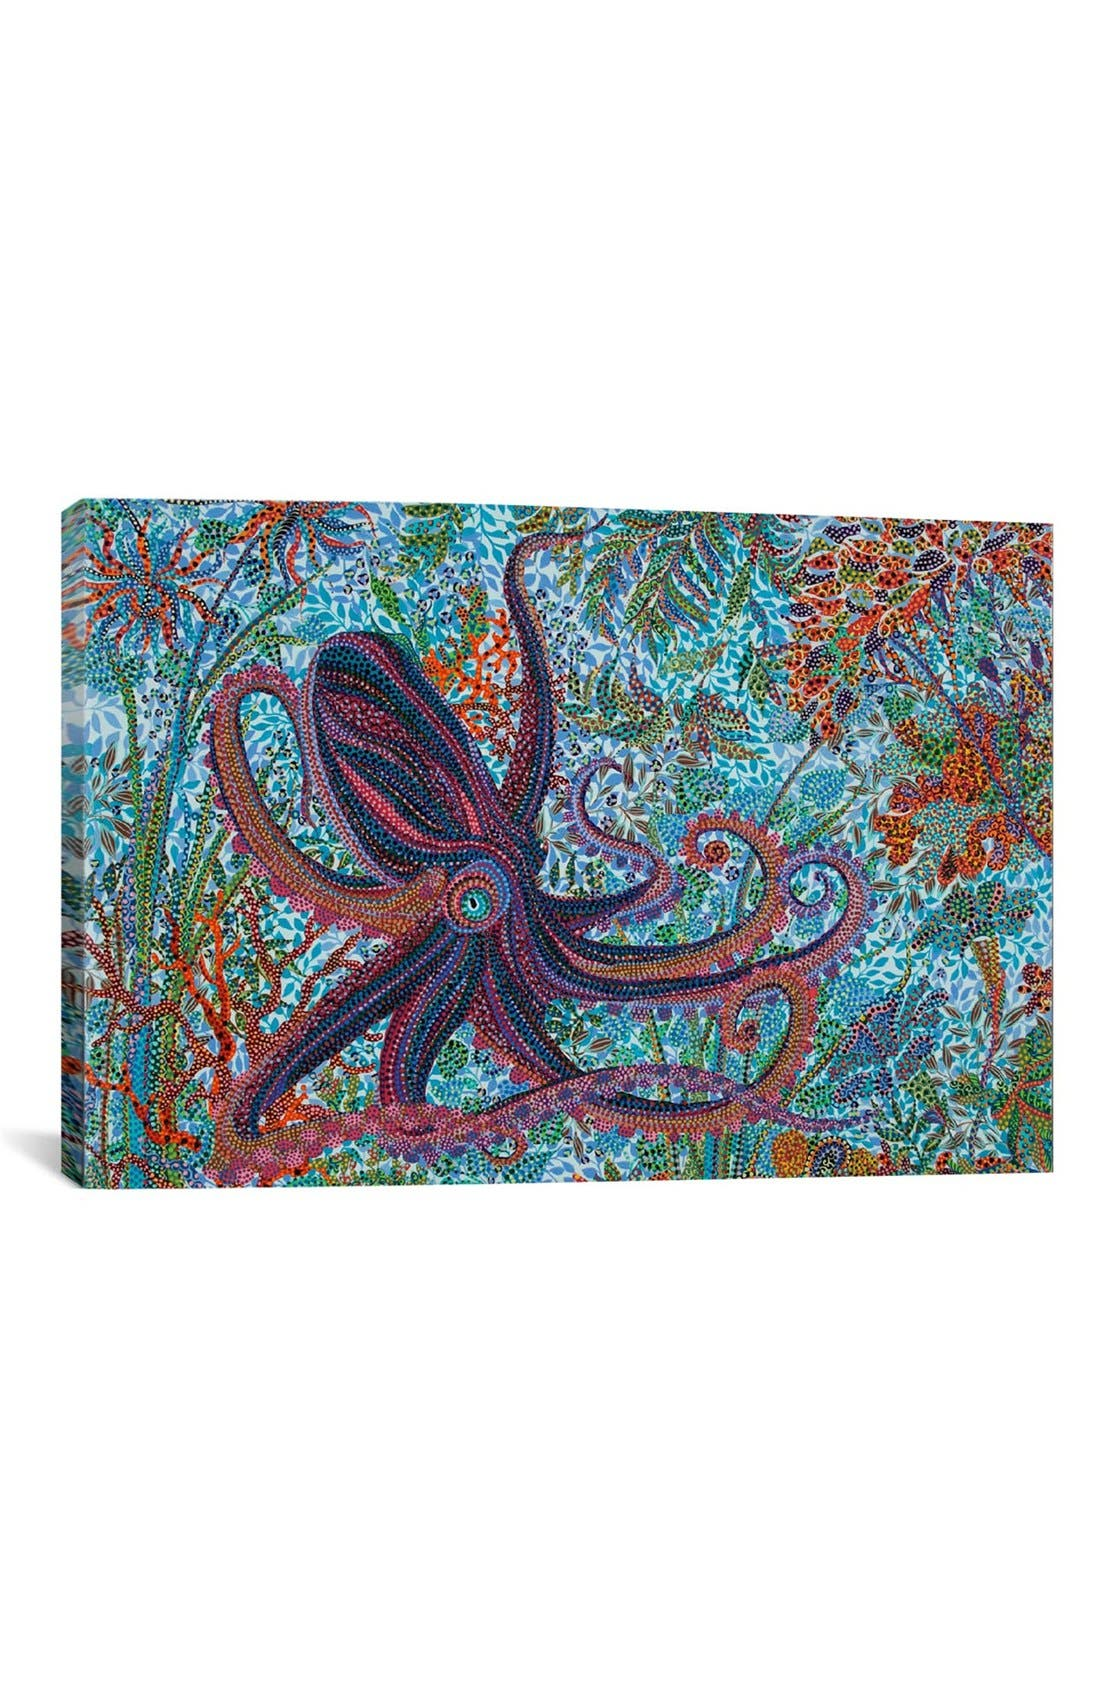 'Octopus - Ebova' Giclée Print Canvas Art,                         Main,                         color,